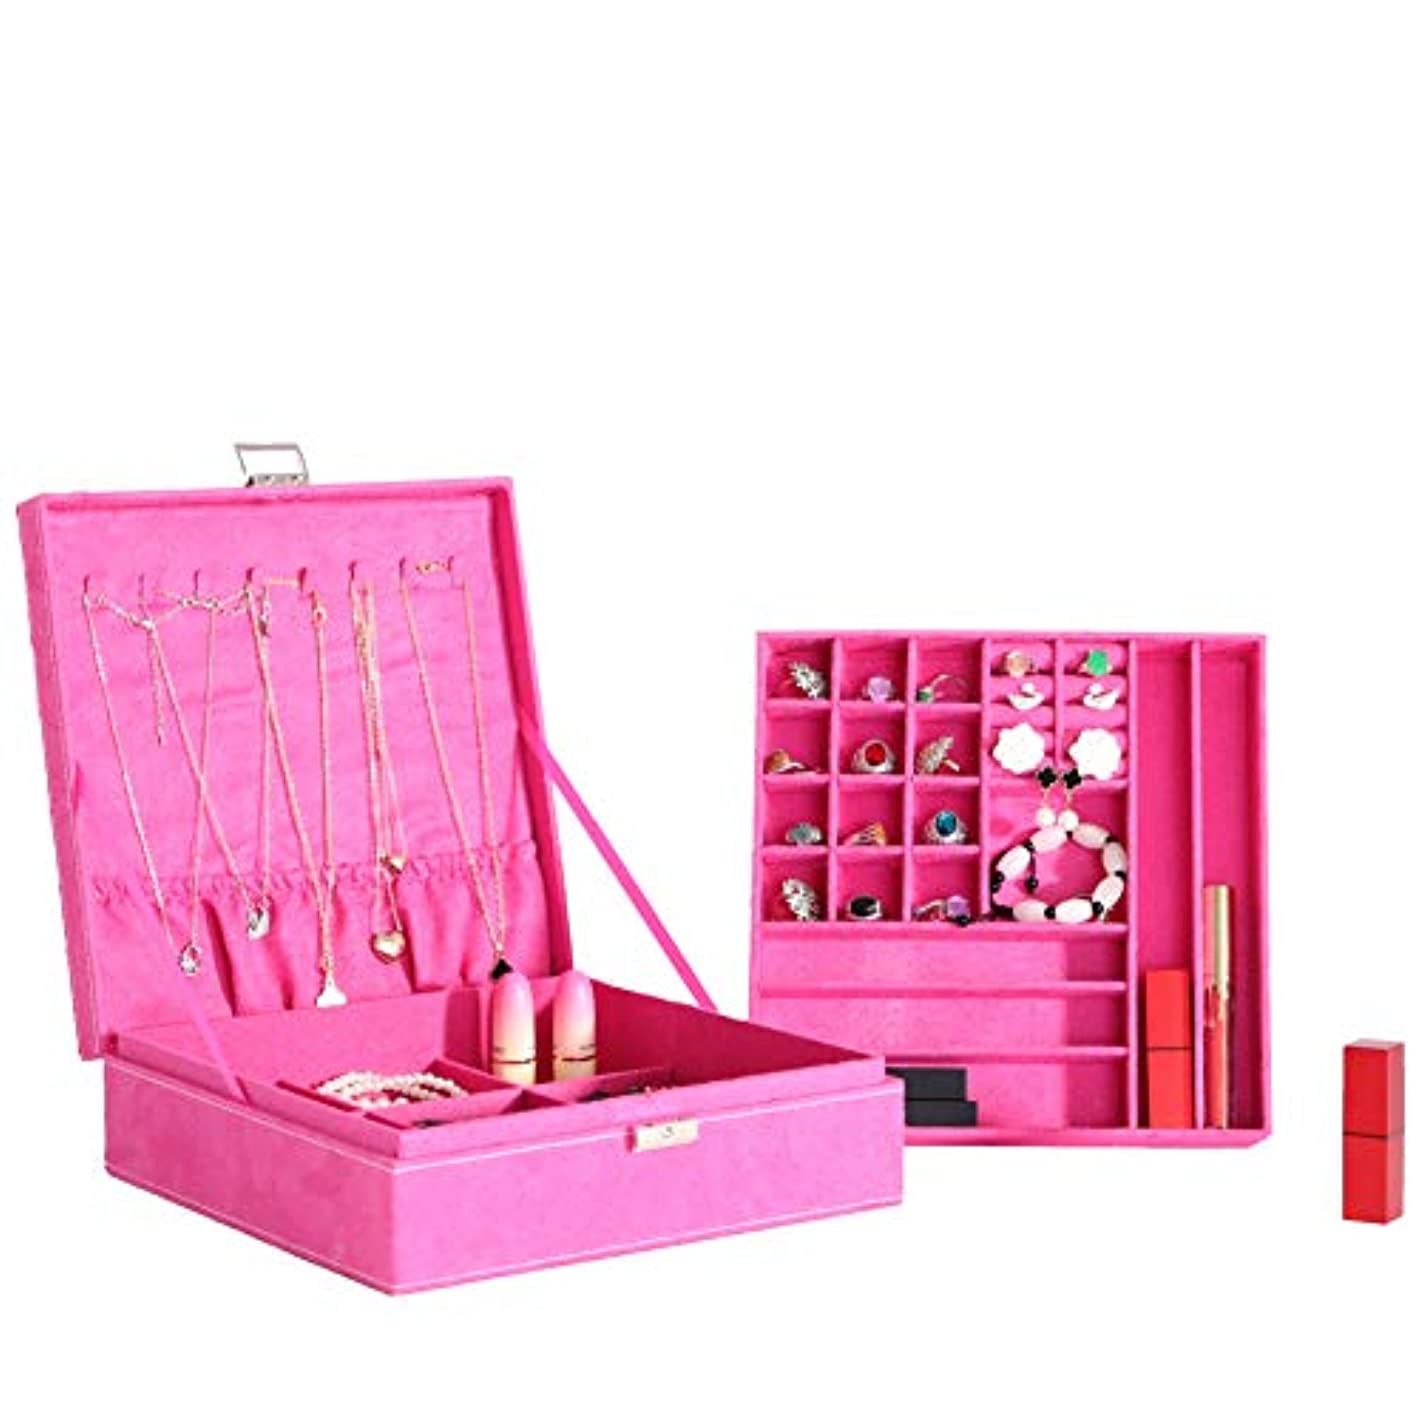 PENGKE 2 Layer Jewelry Box Organizer Display Storage case with Lock,Pink of 1